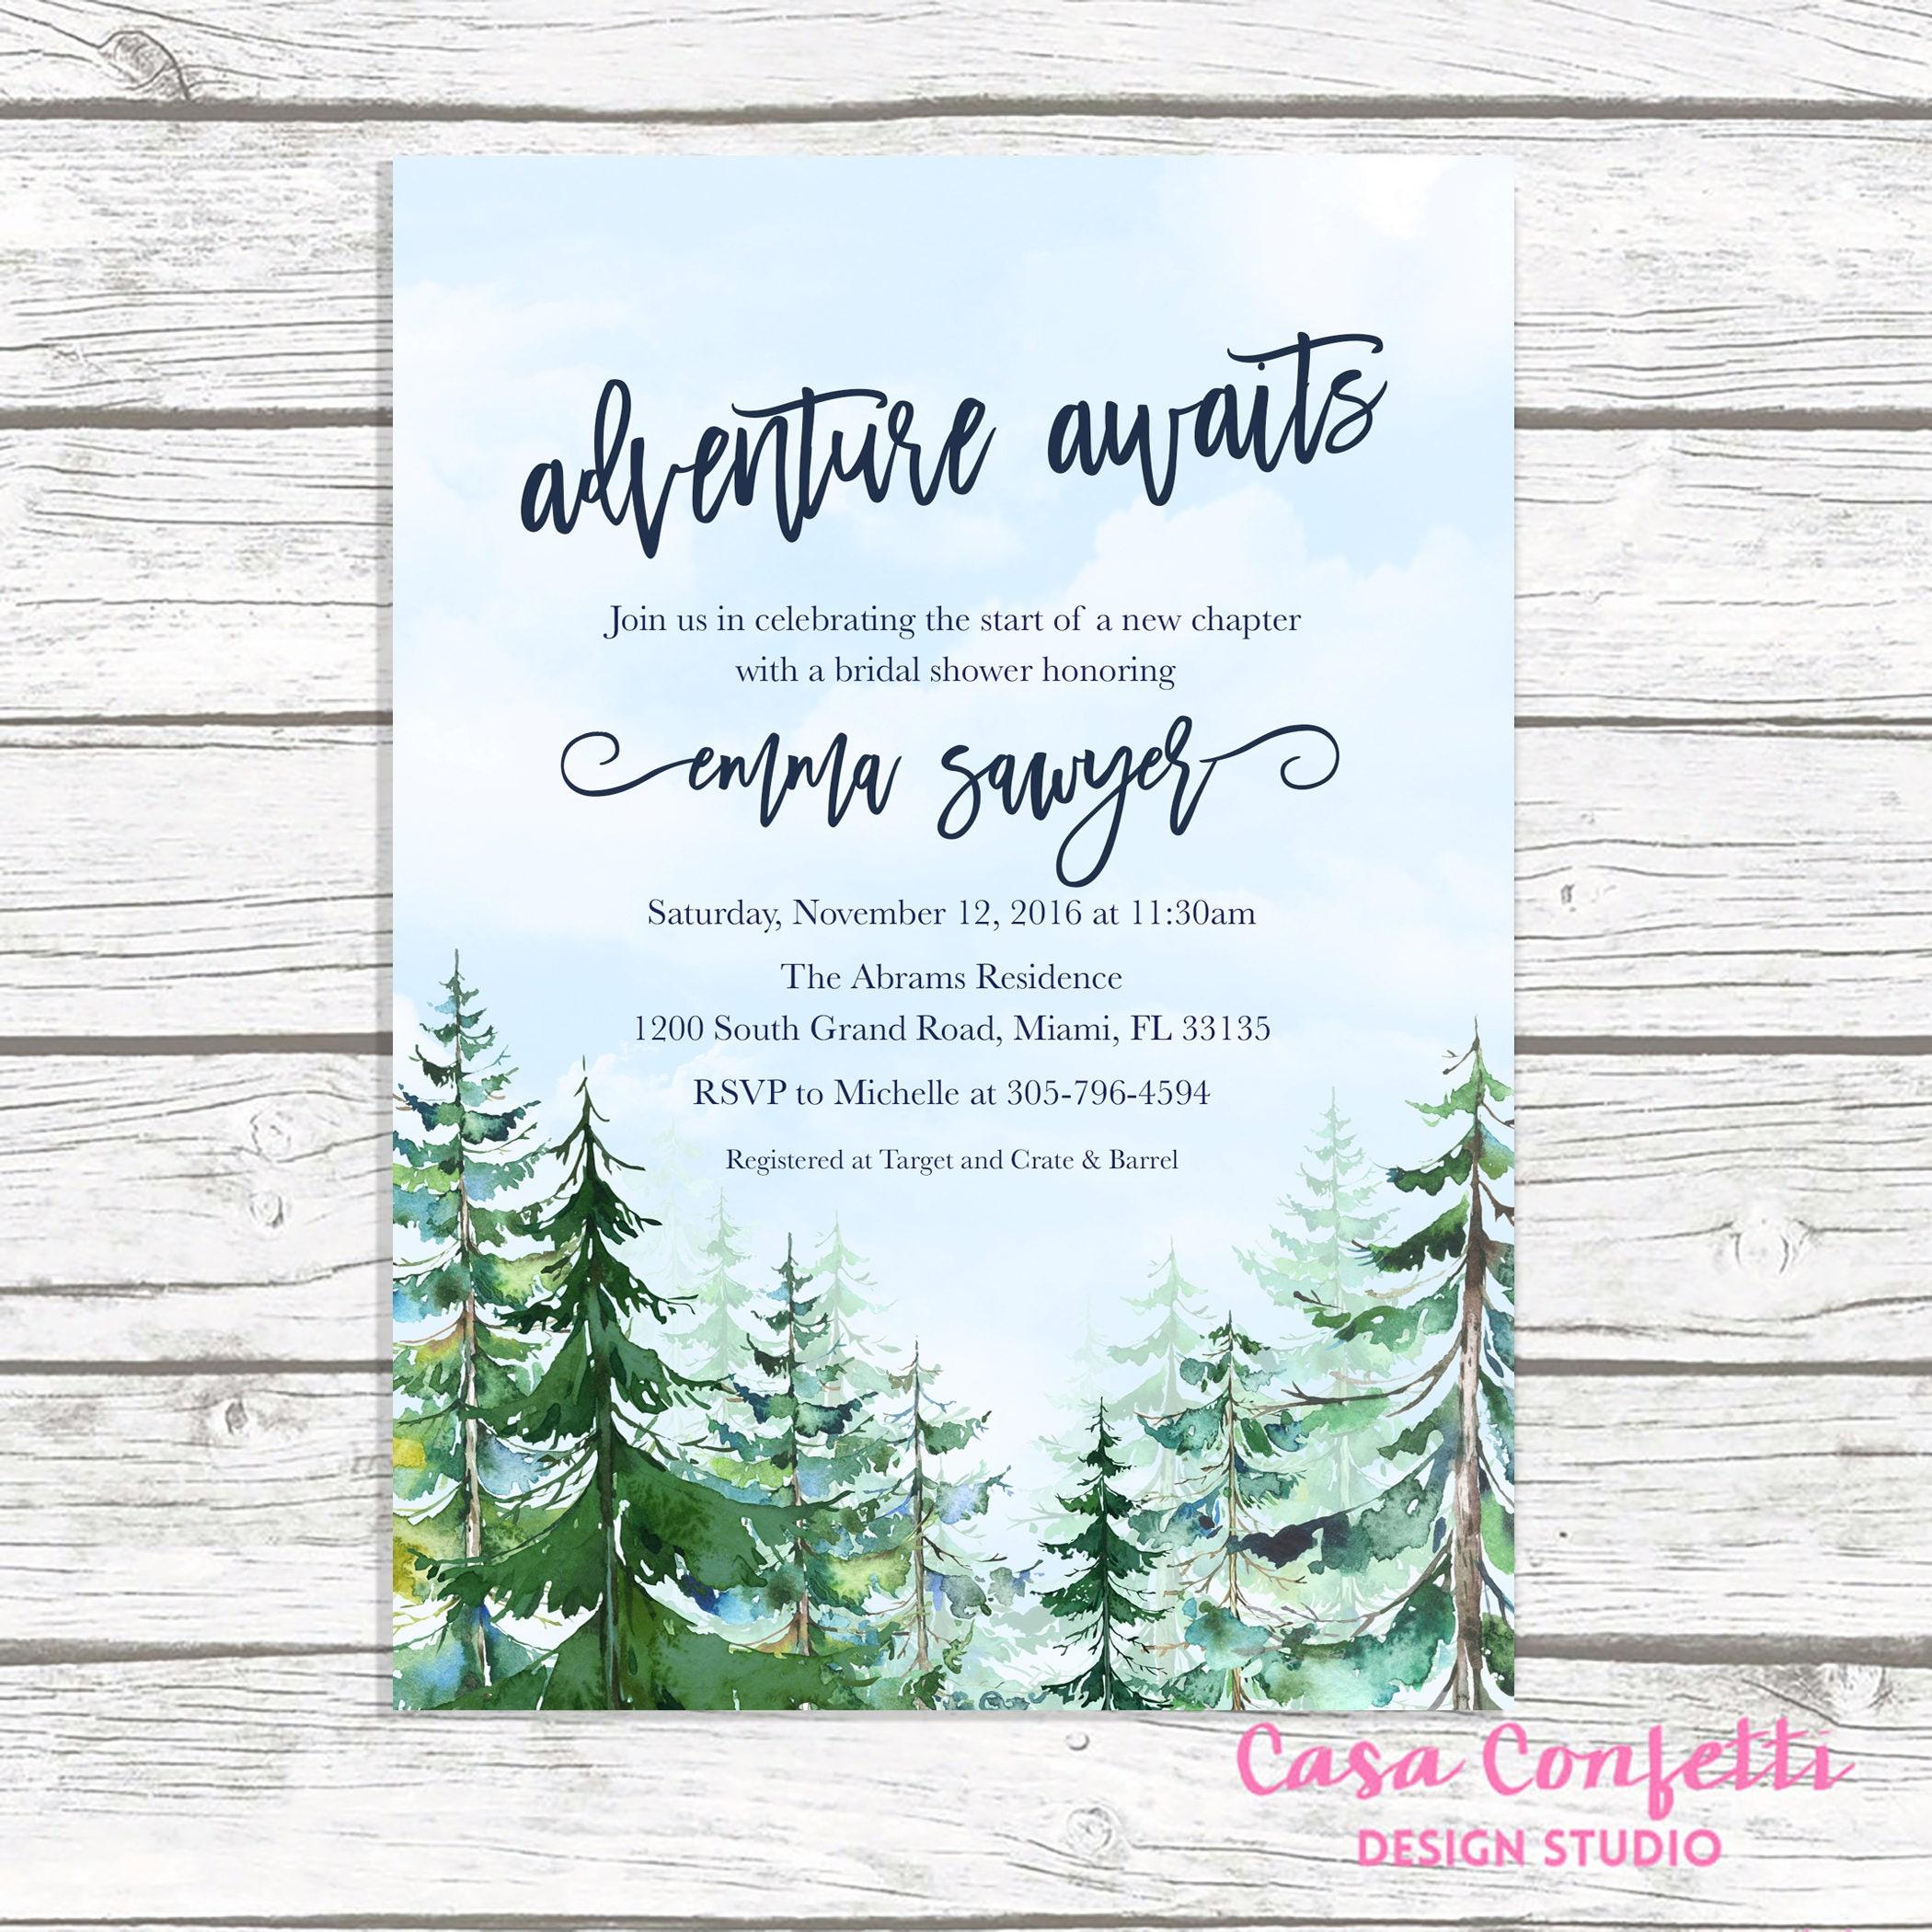 adventure bridal shower invitation mountain bridal shower invitation conifer trees bridal shower winter bridal shower adventure awaits